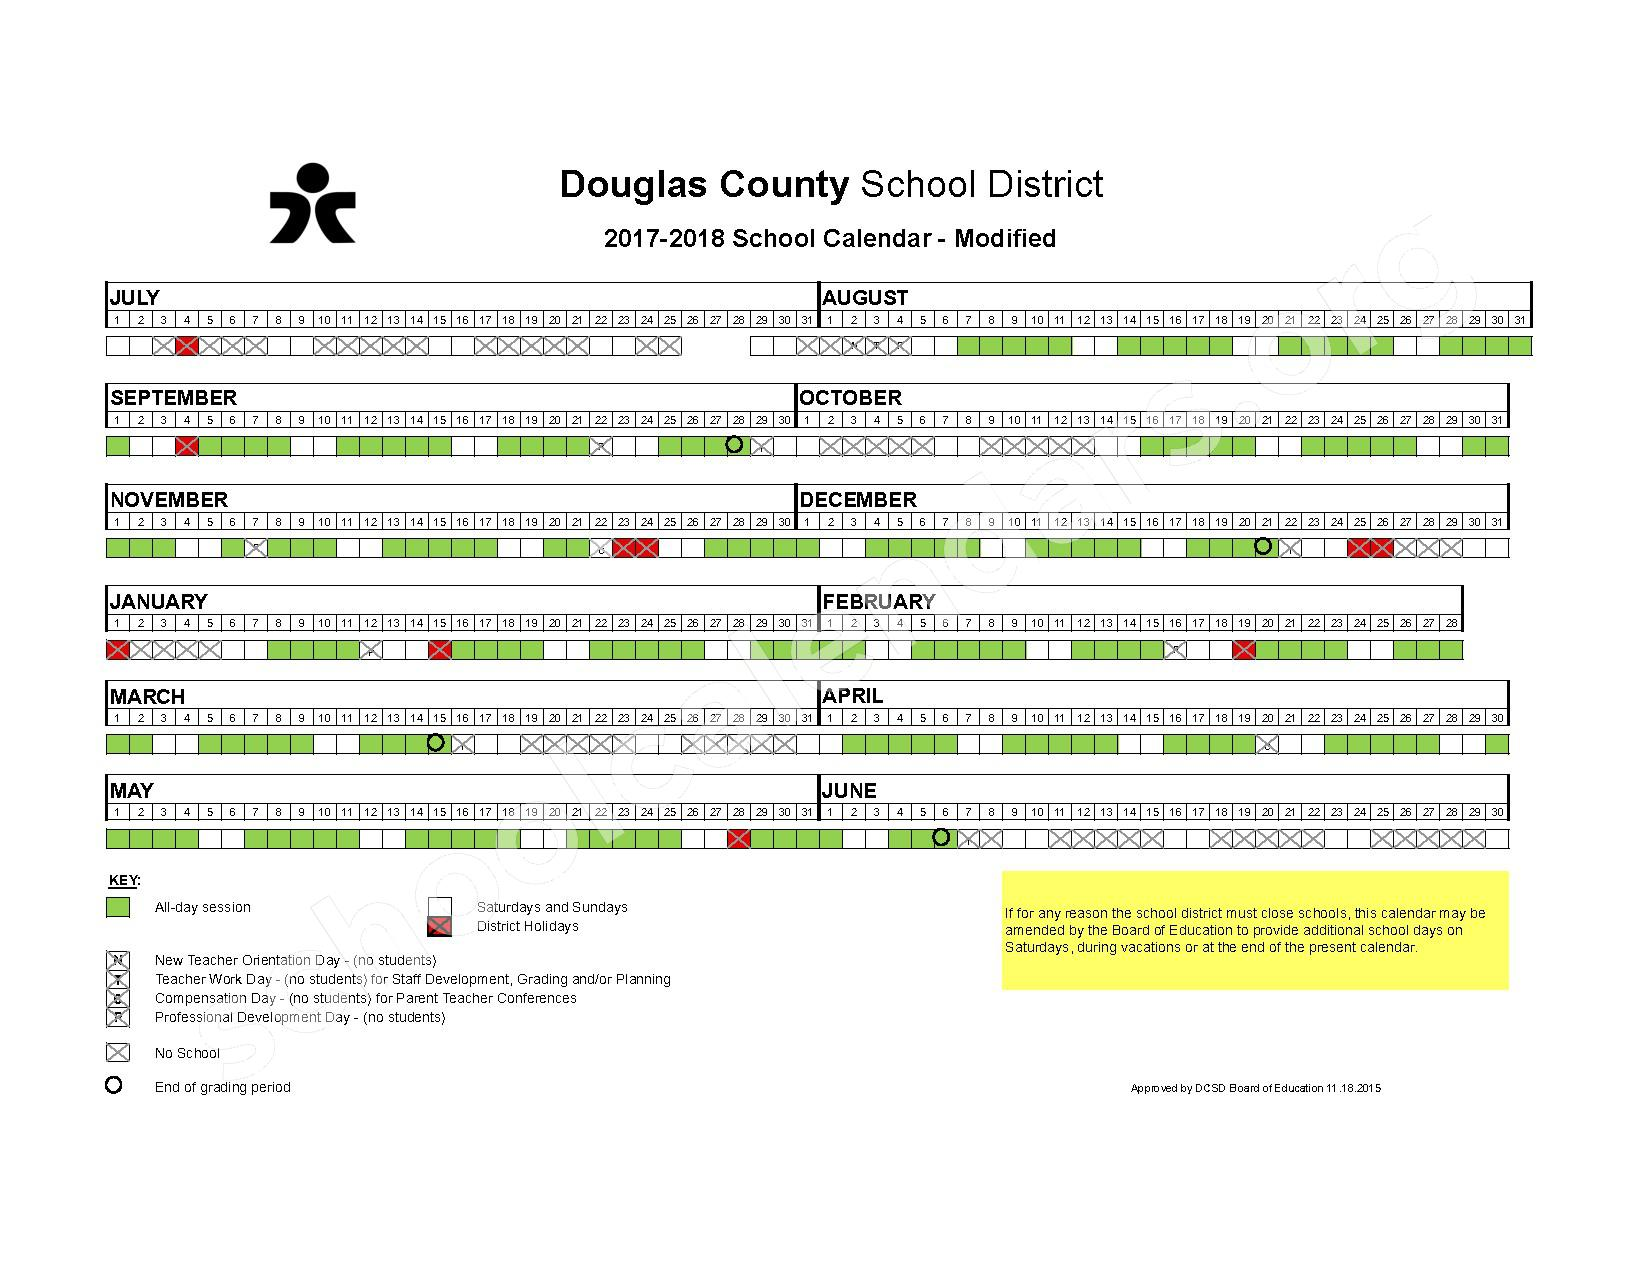 2017 - 2018 Modified School Calendar – Douglas County School District – page 1